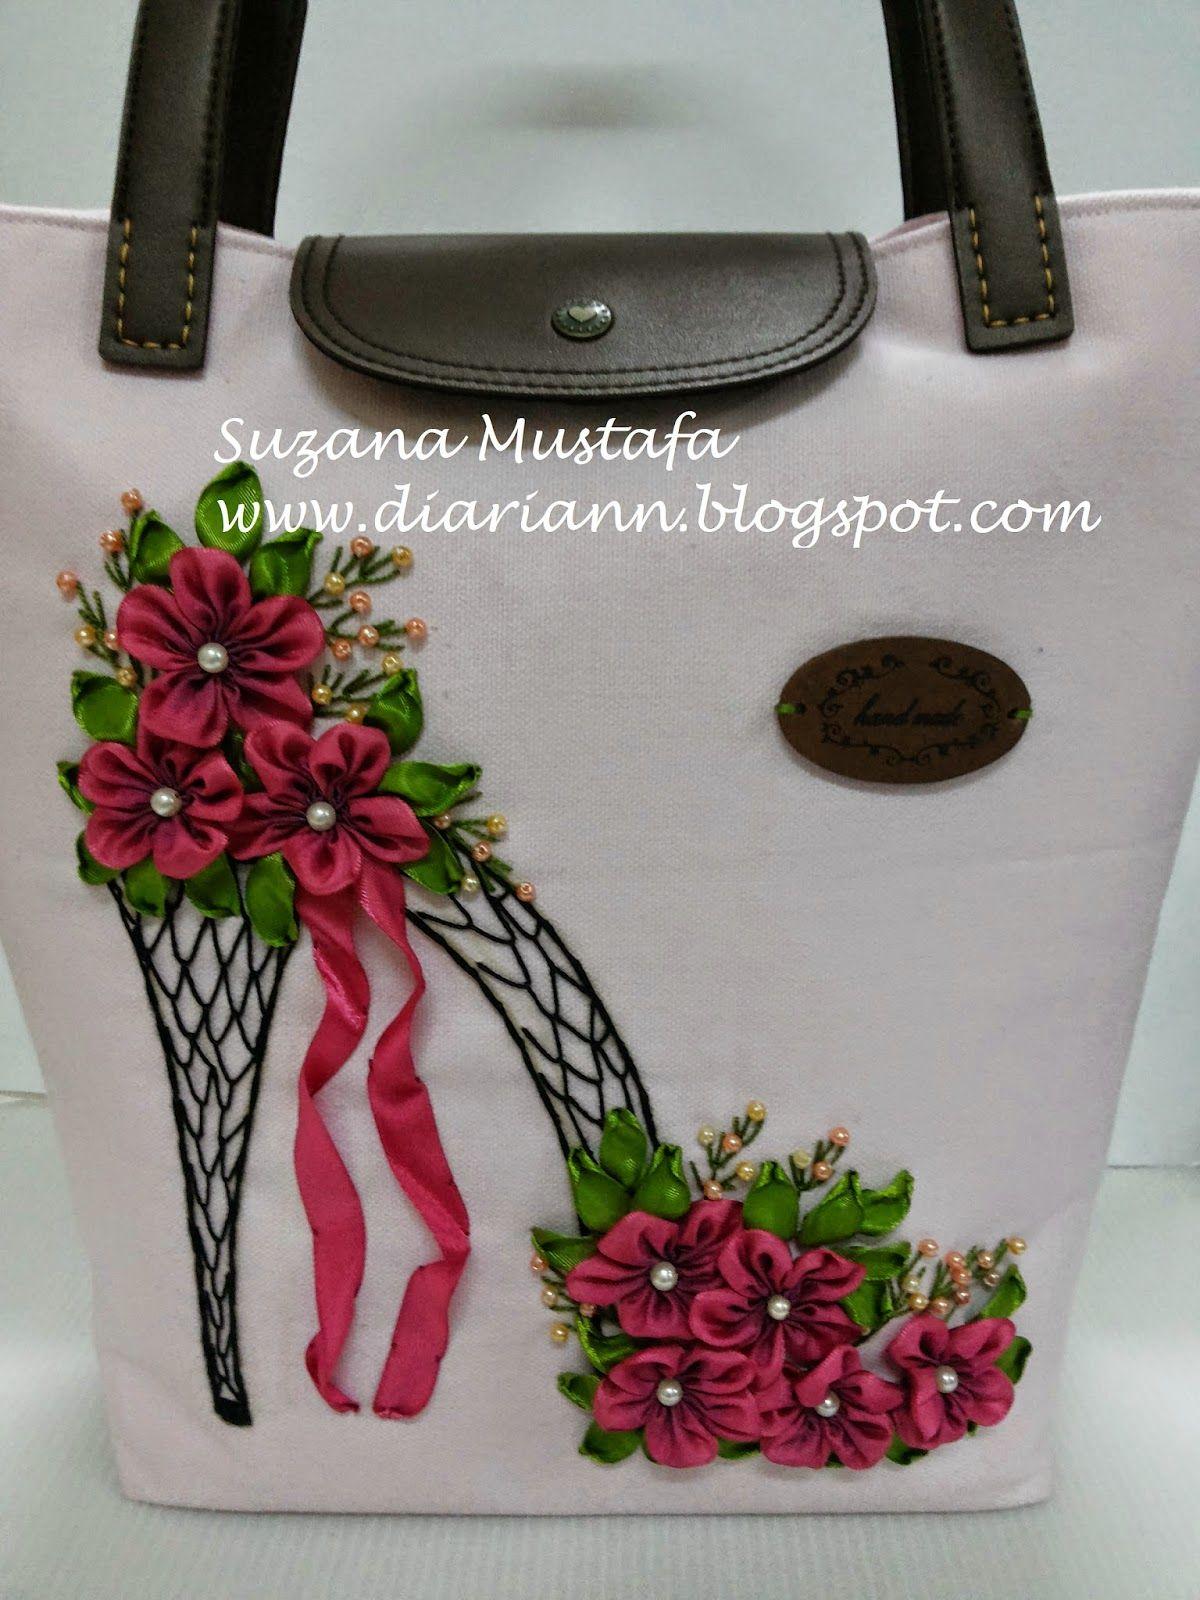 Suzana Mustafa Hand Bag Bolsos Carteras Pinterest Ribbon